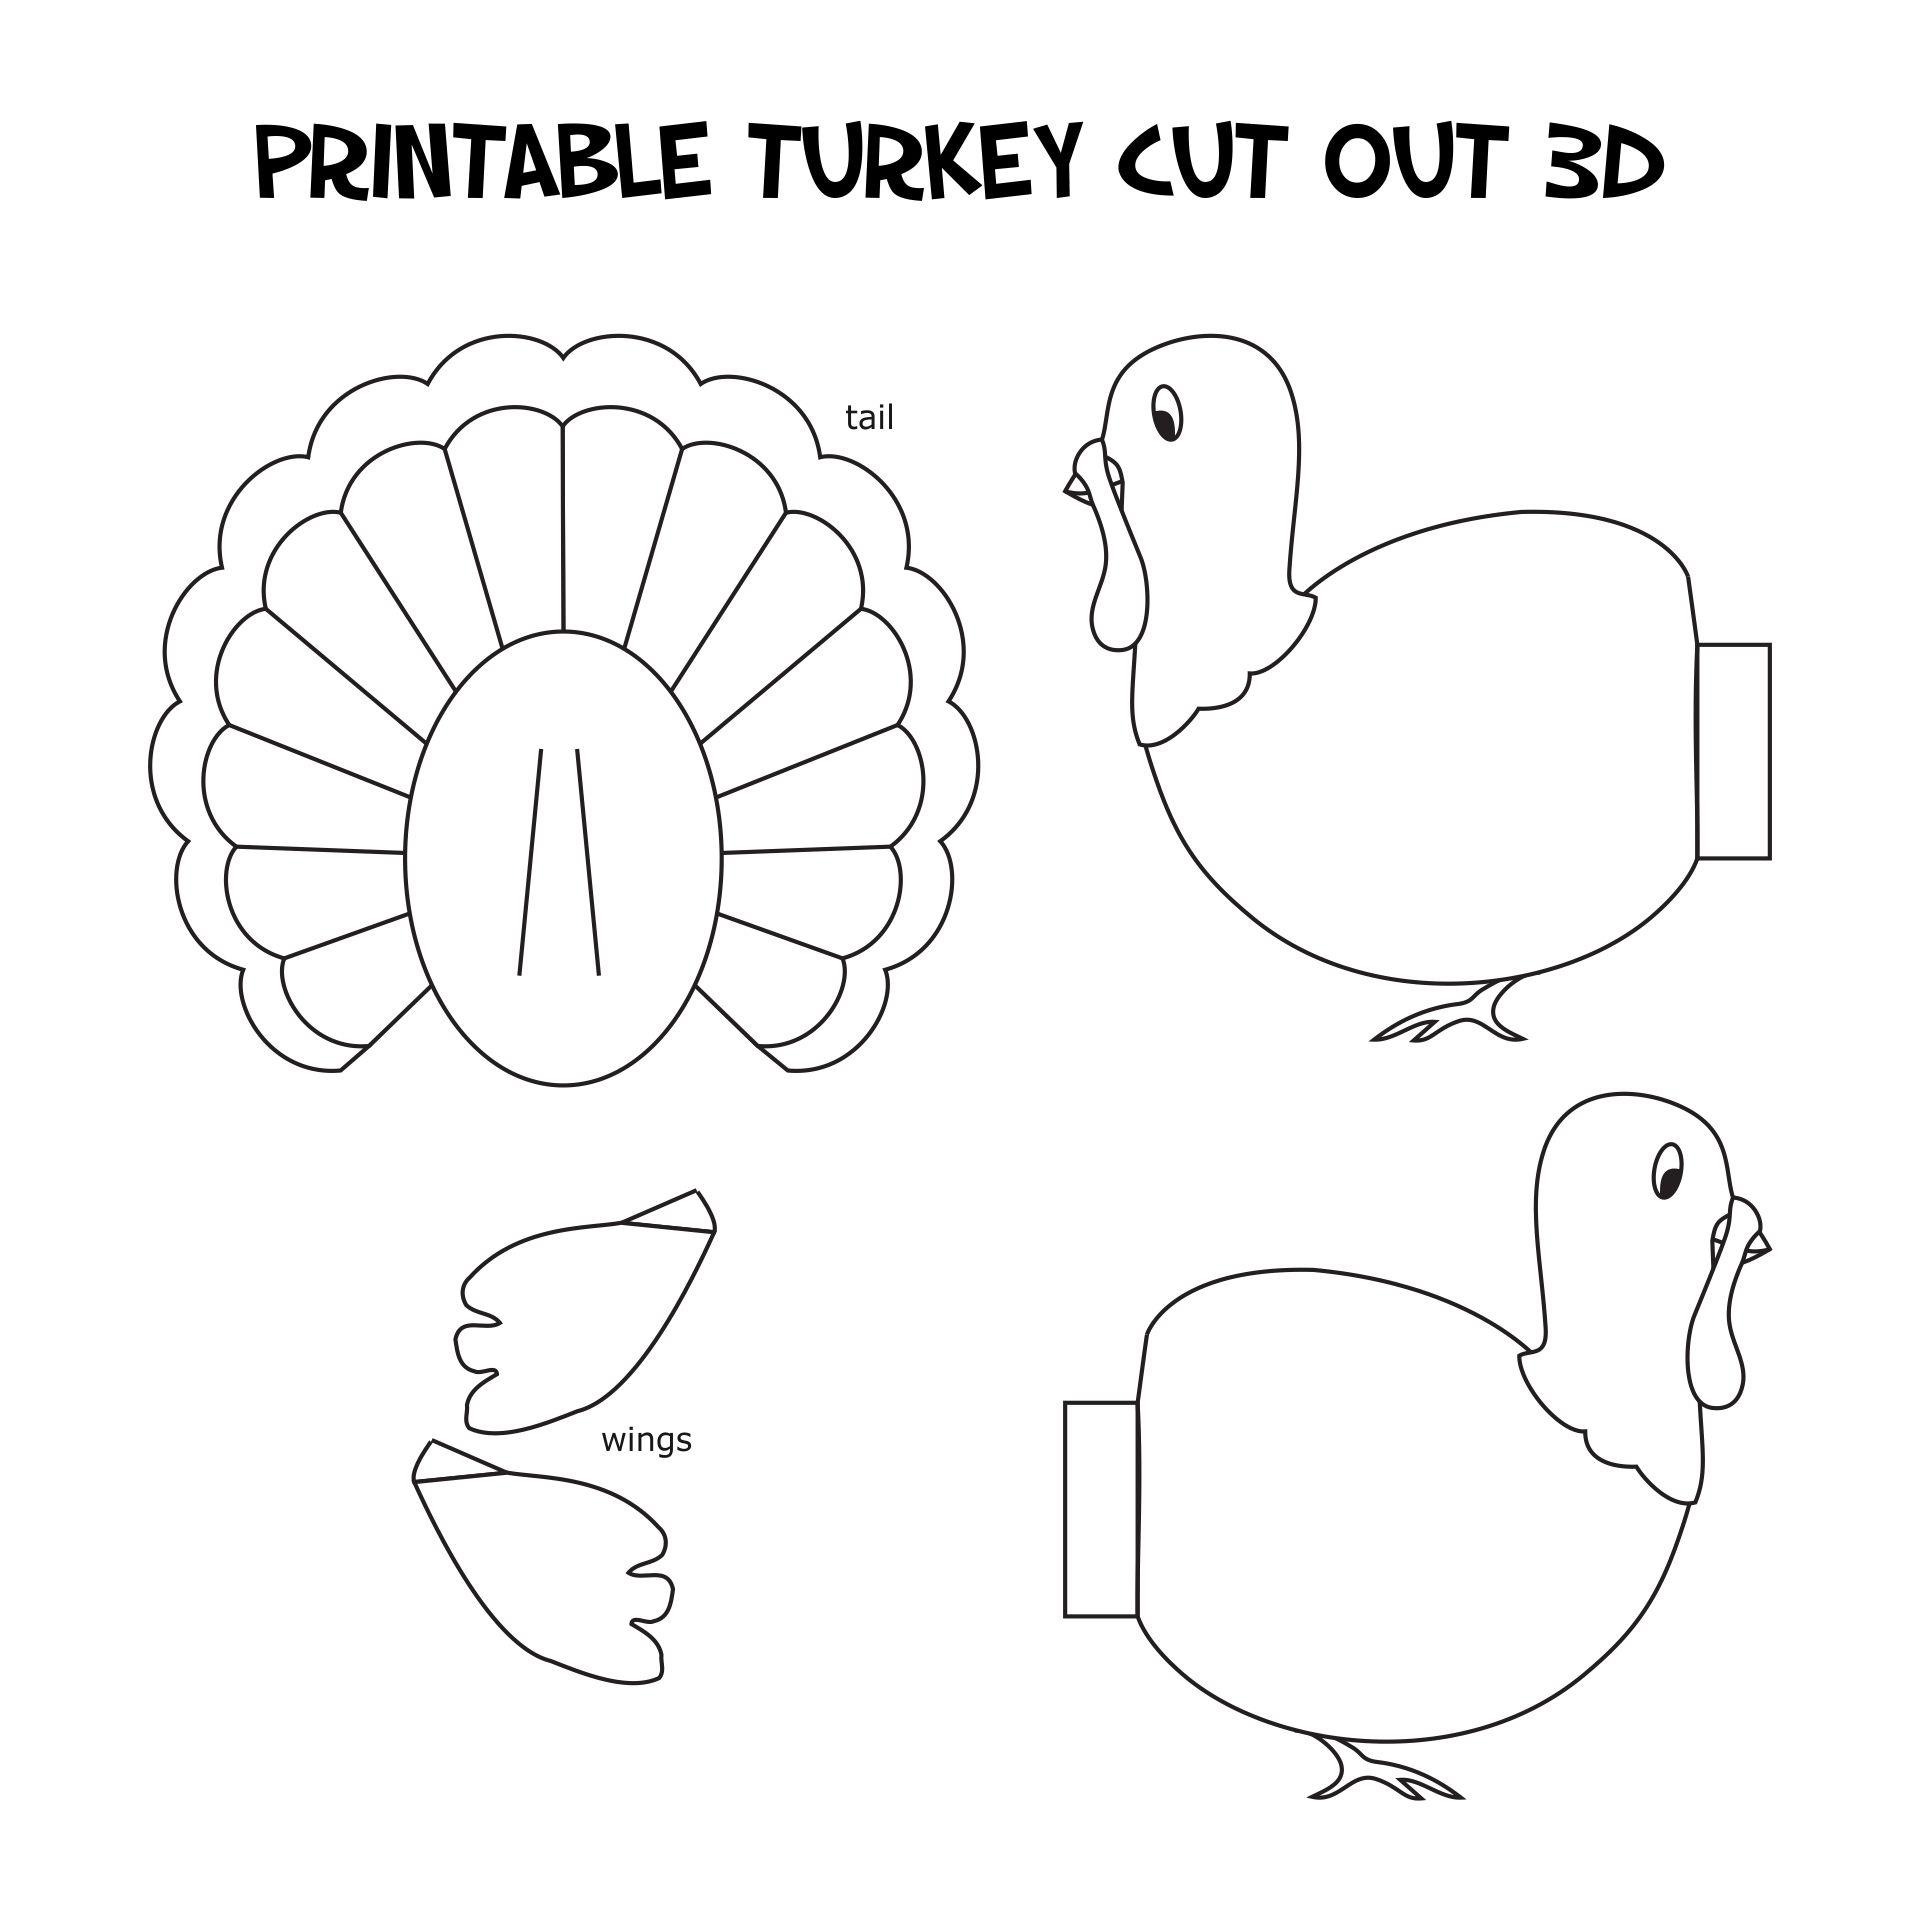 Printable Turkey Cut Out 3D